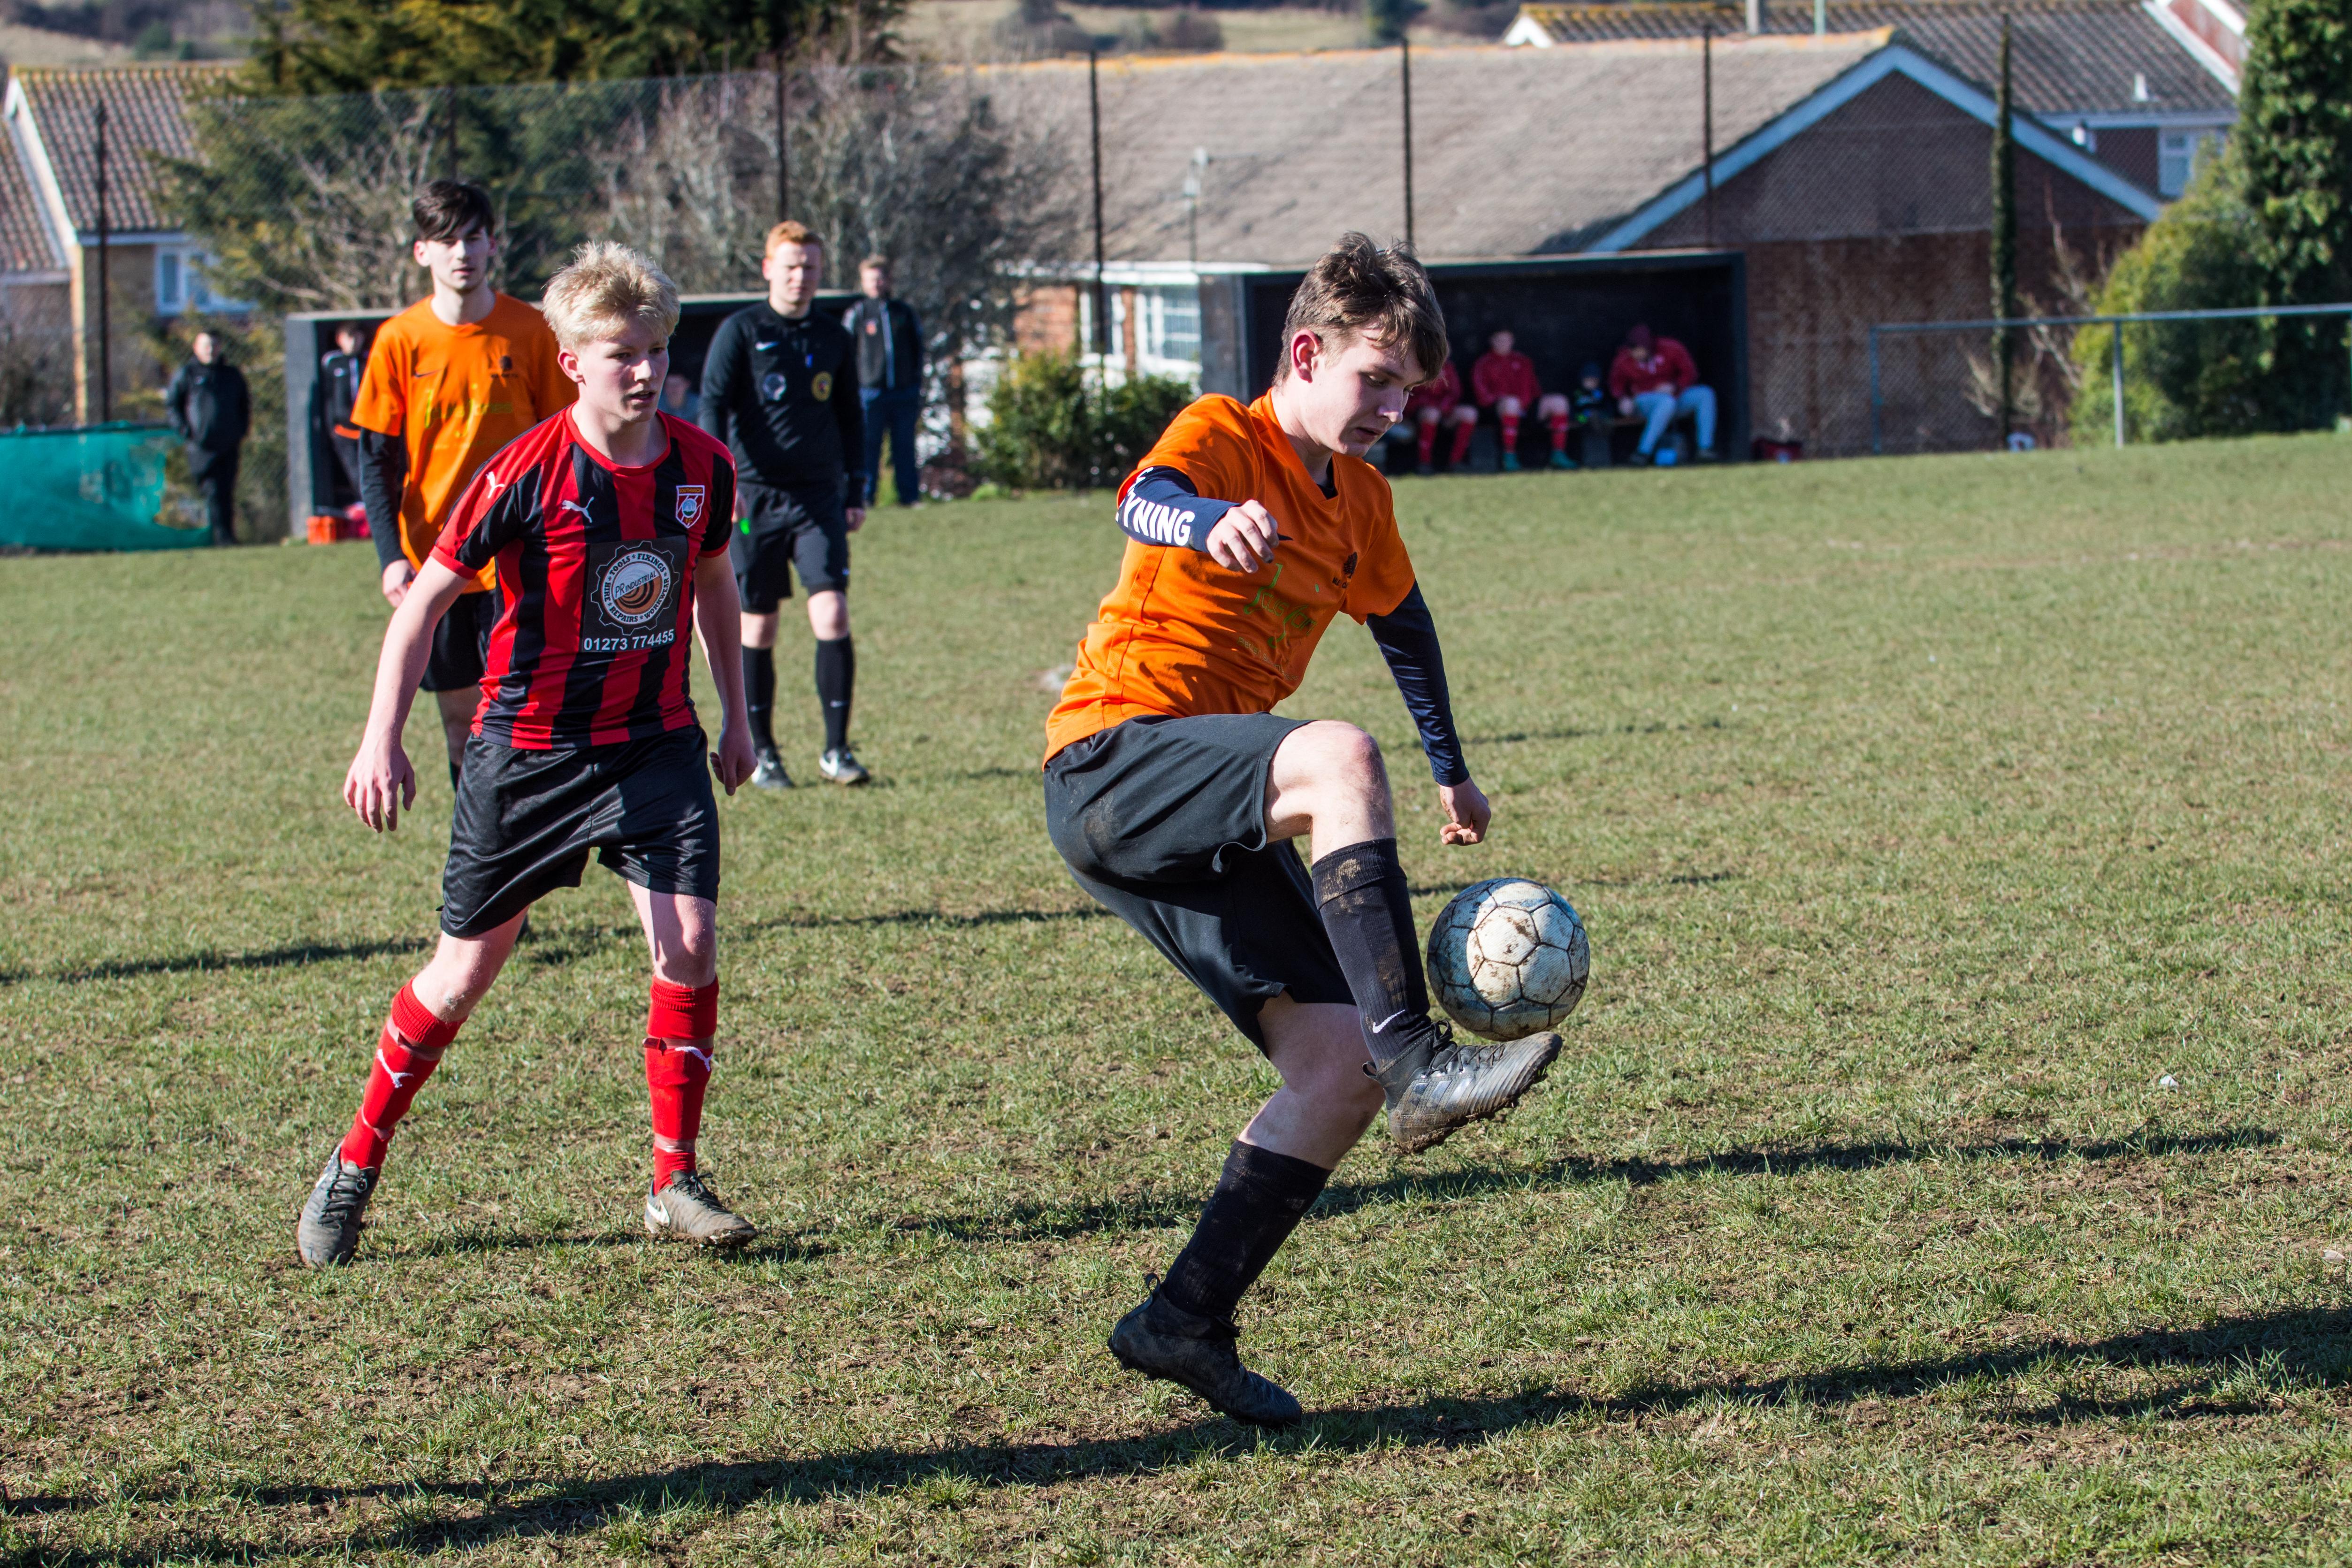 Mile Oak FC U18s vs Southwick FC U18s 25.02.18 07 DAVID_JEFFERY